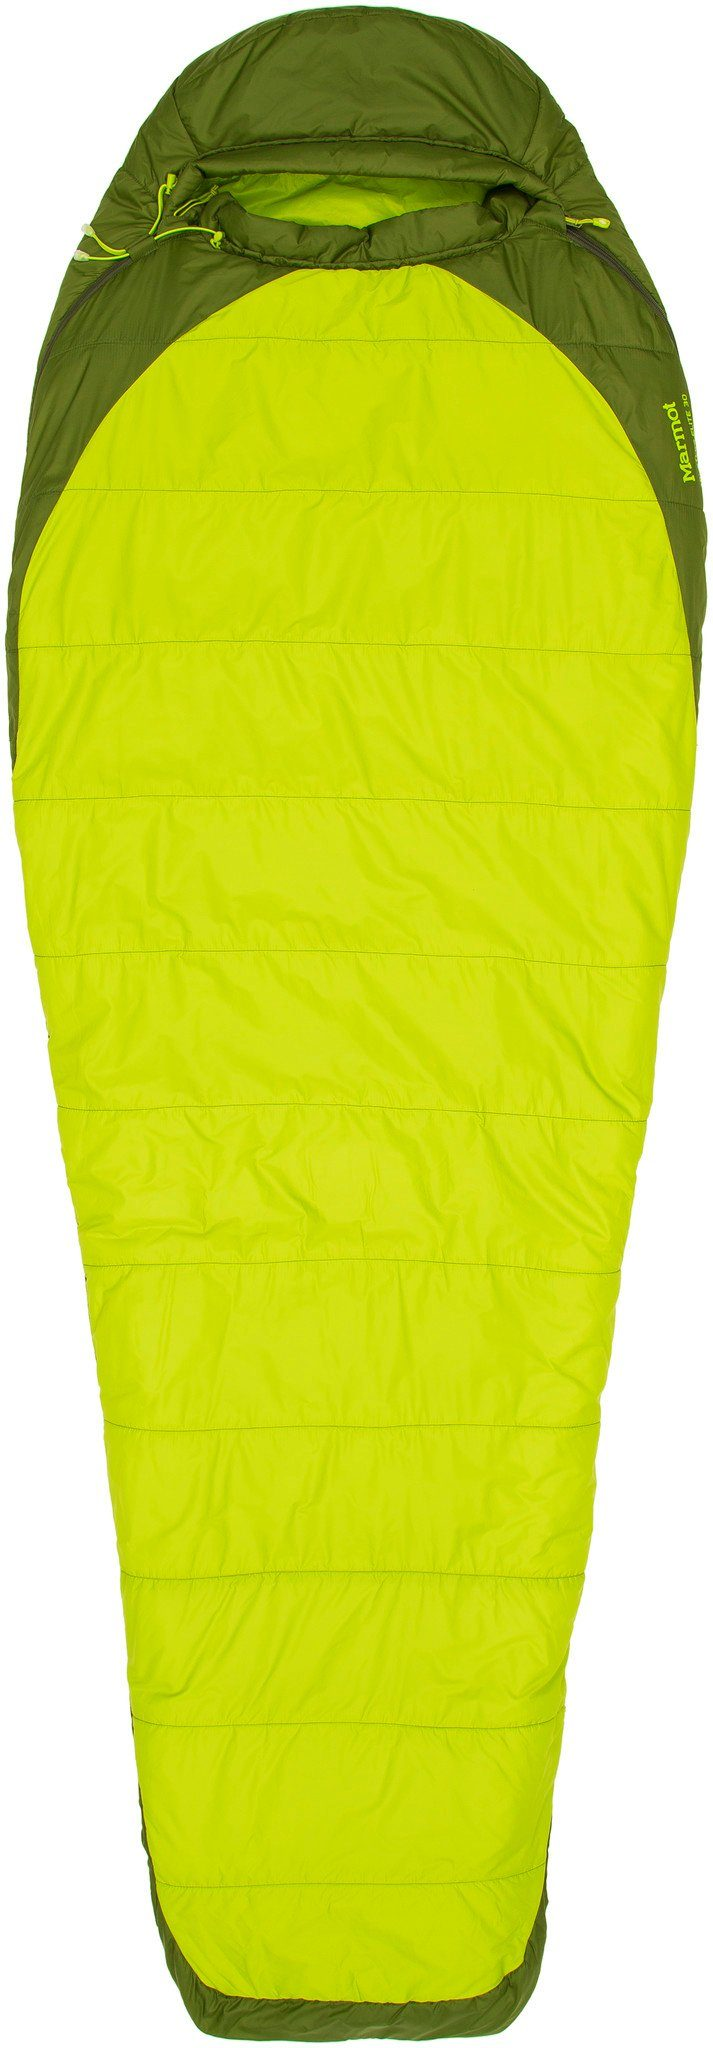 Marmot Schlafsack »Trestles Elite 30 Sleeping Bag Long«